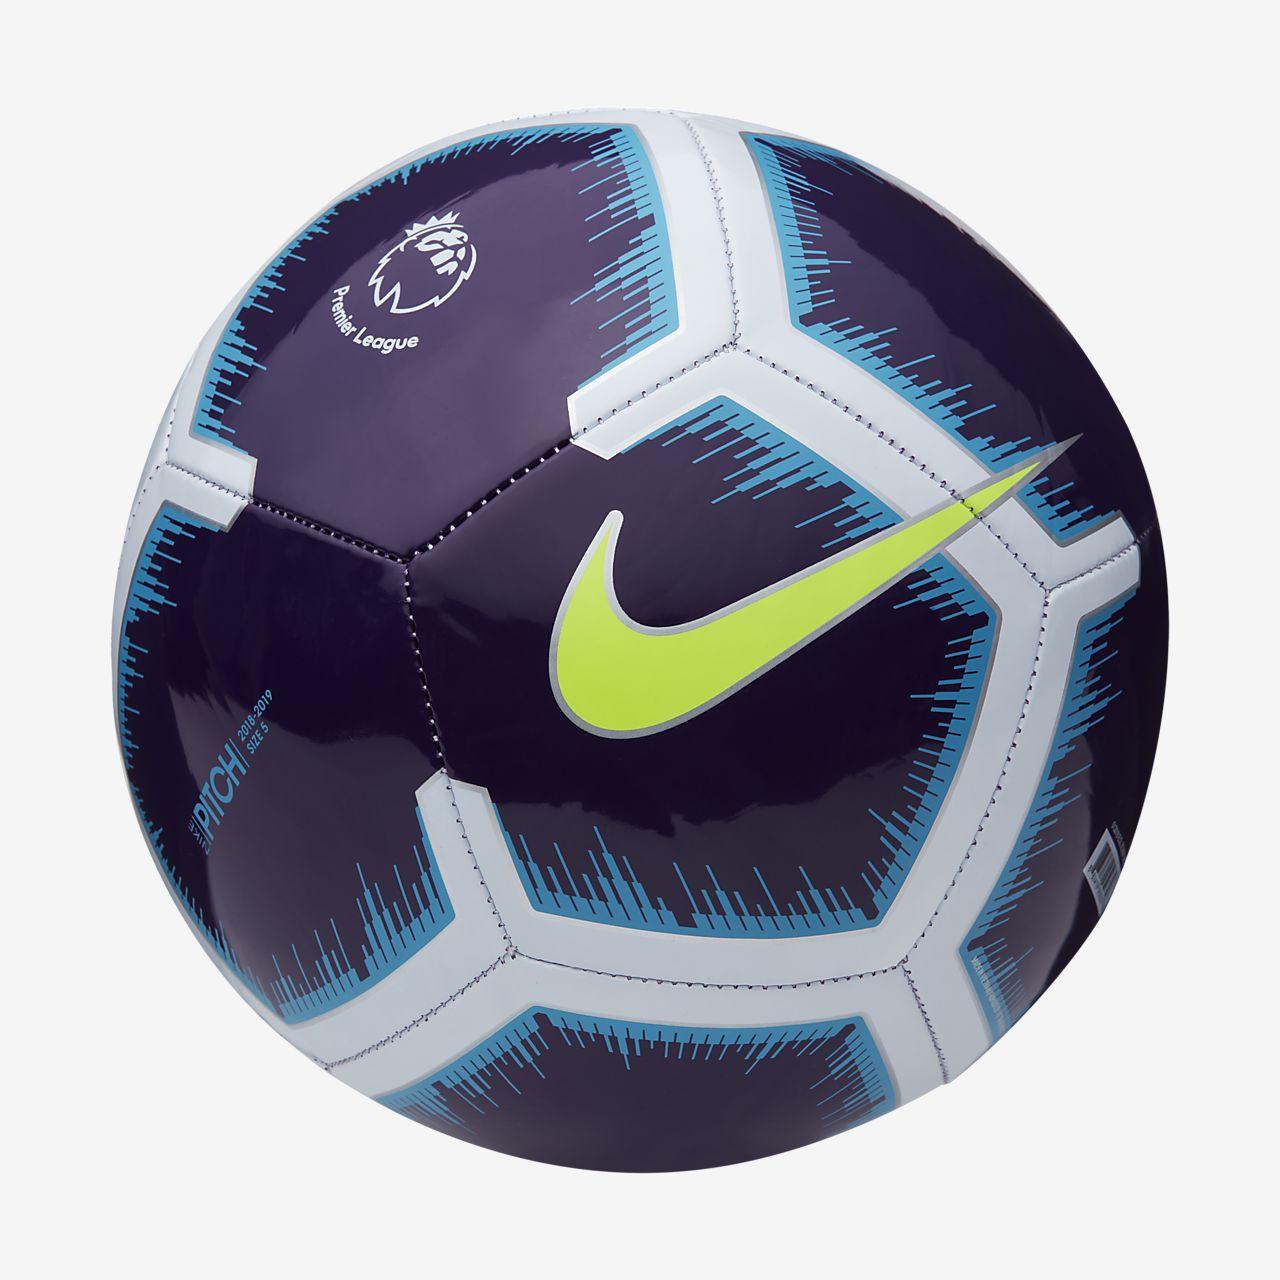 Premier League Pitch Balón de fútbol. Nike.com ES 81054e4dcb6bf